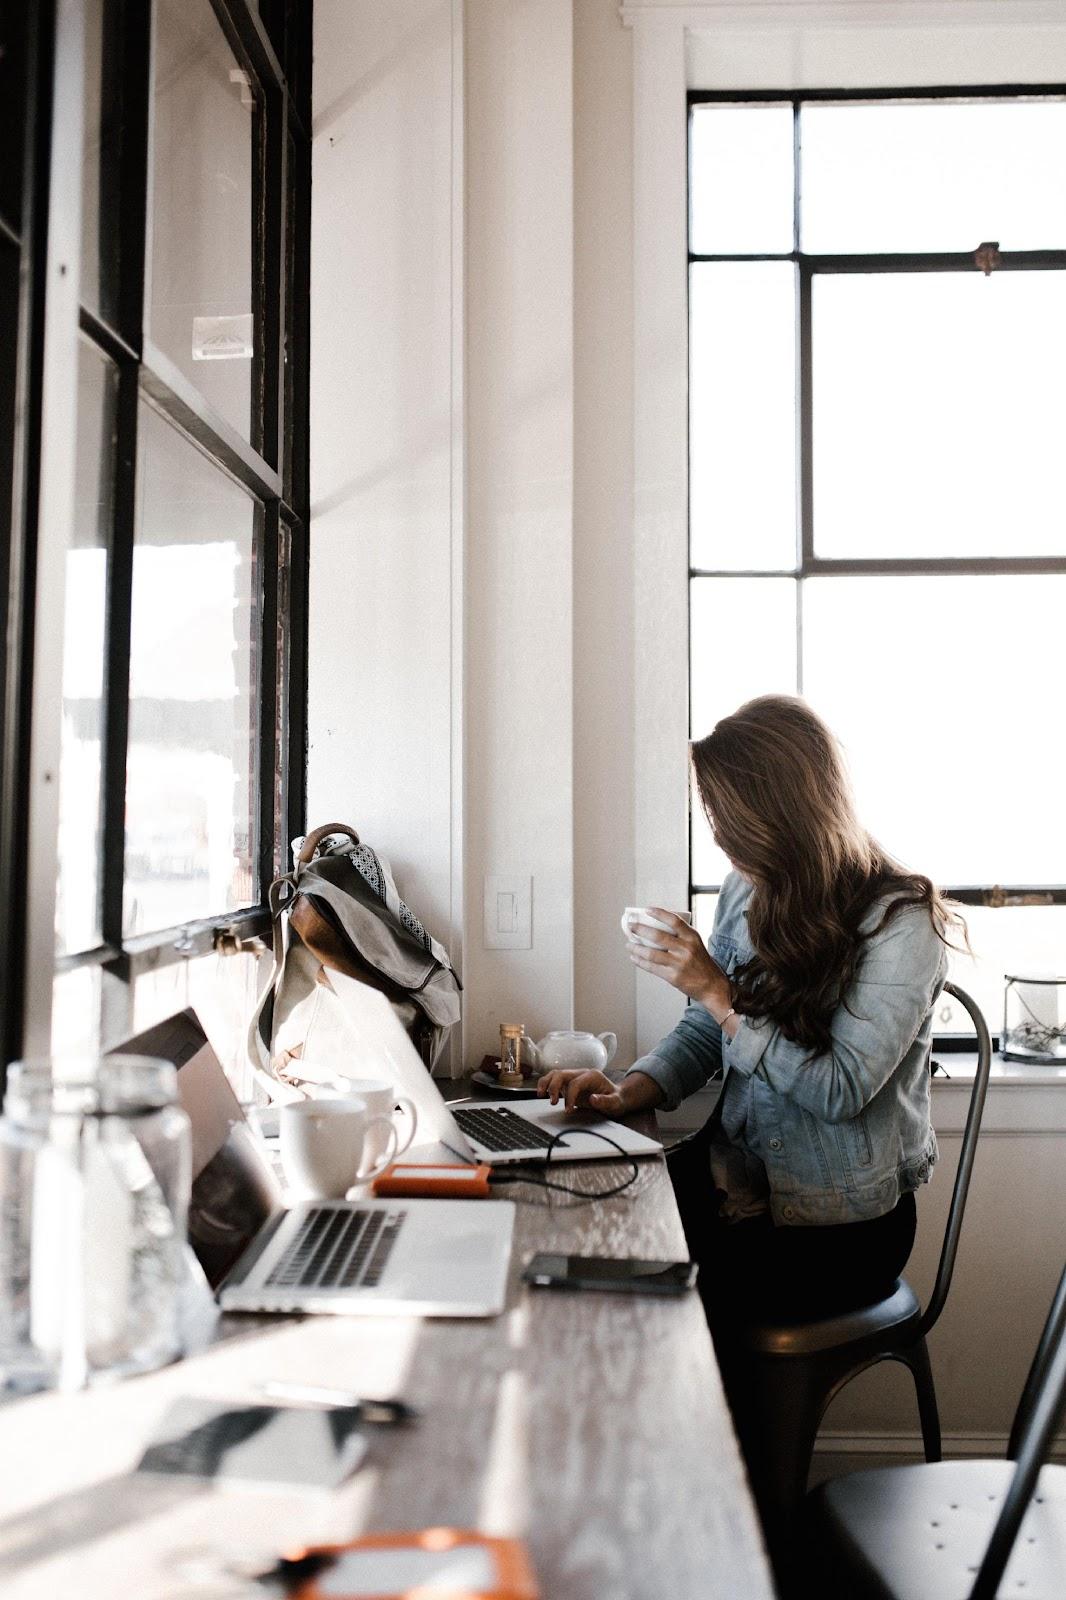 Woman tutoring online.